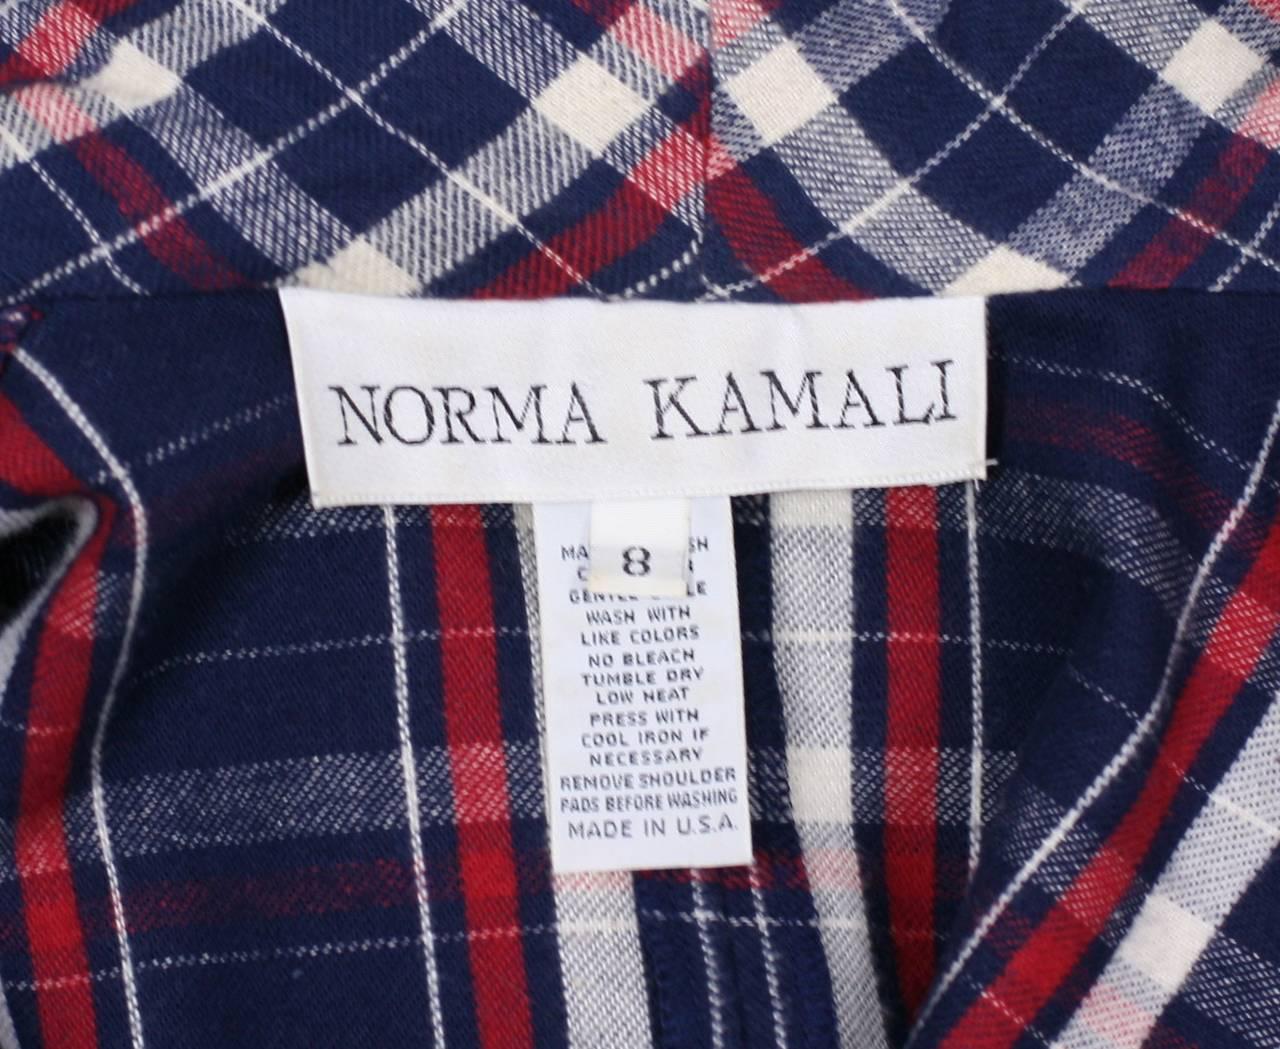 Norma Kamali's Patriotic Flannel Shirtwaist 2